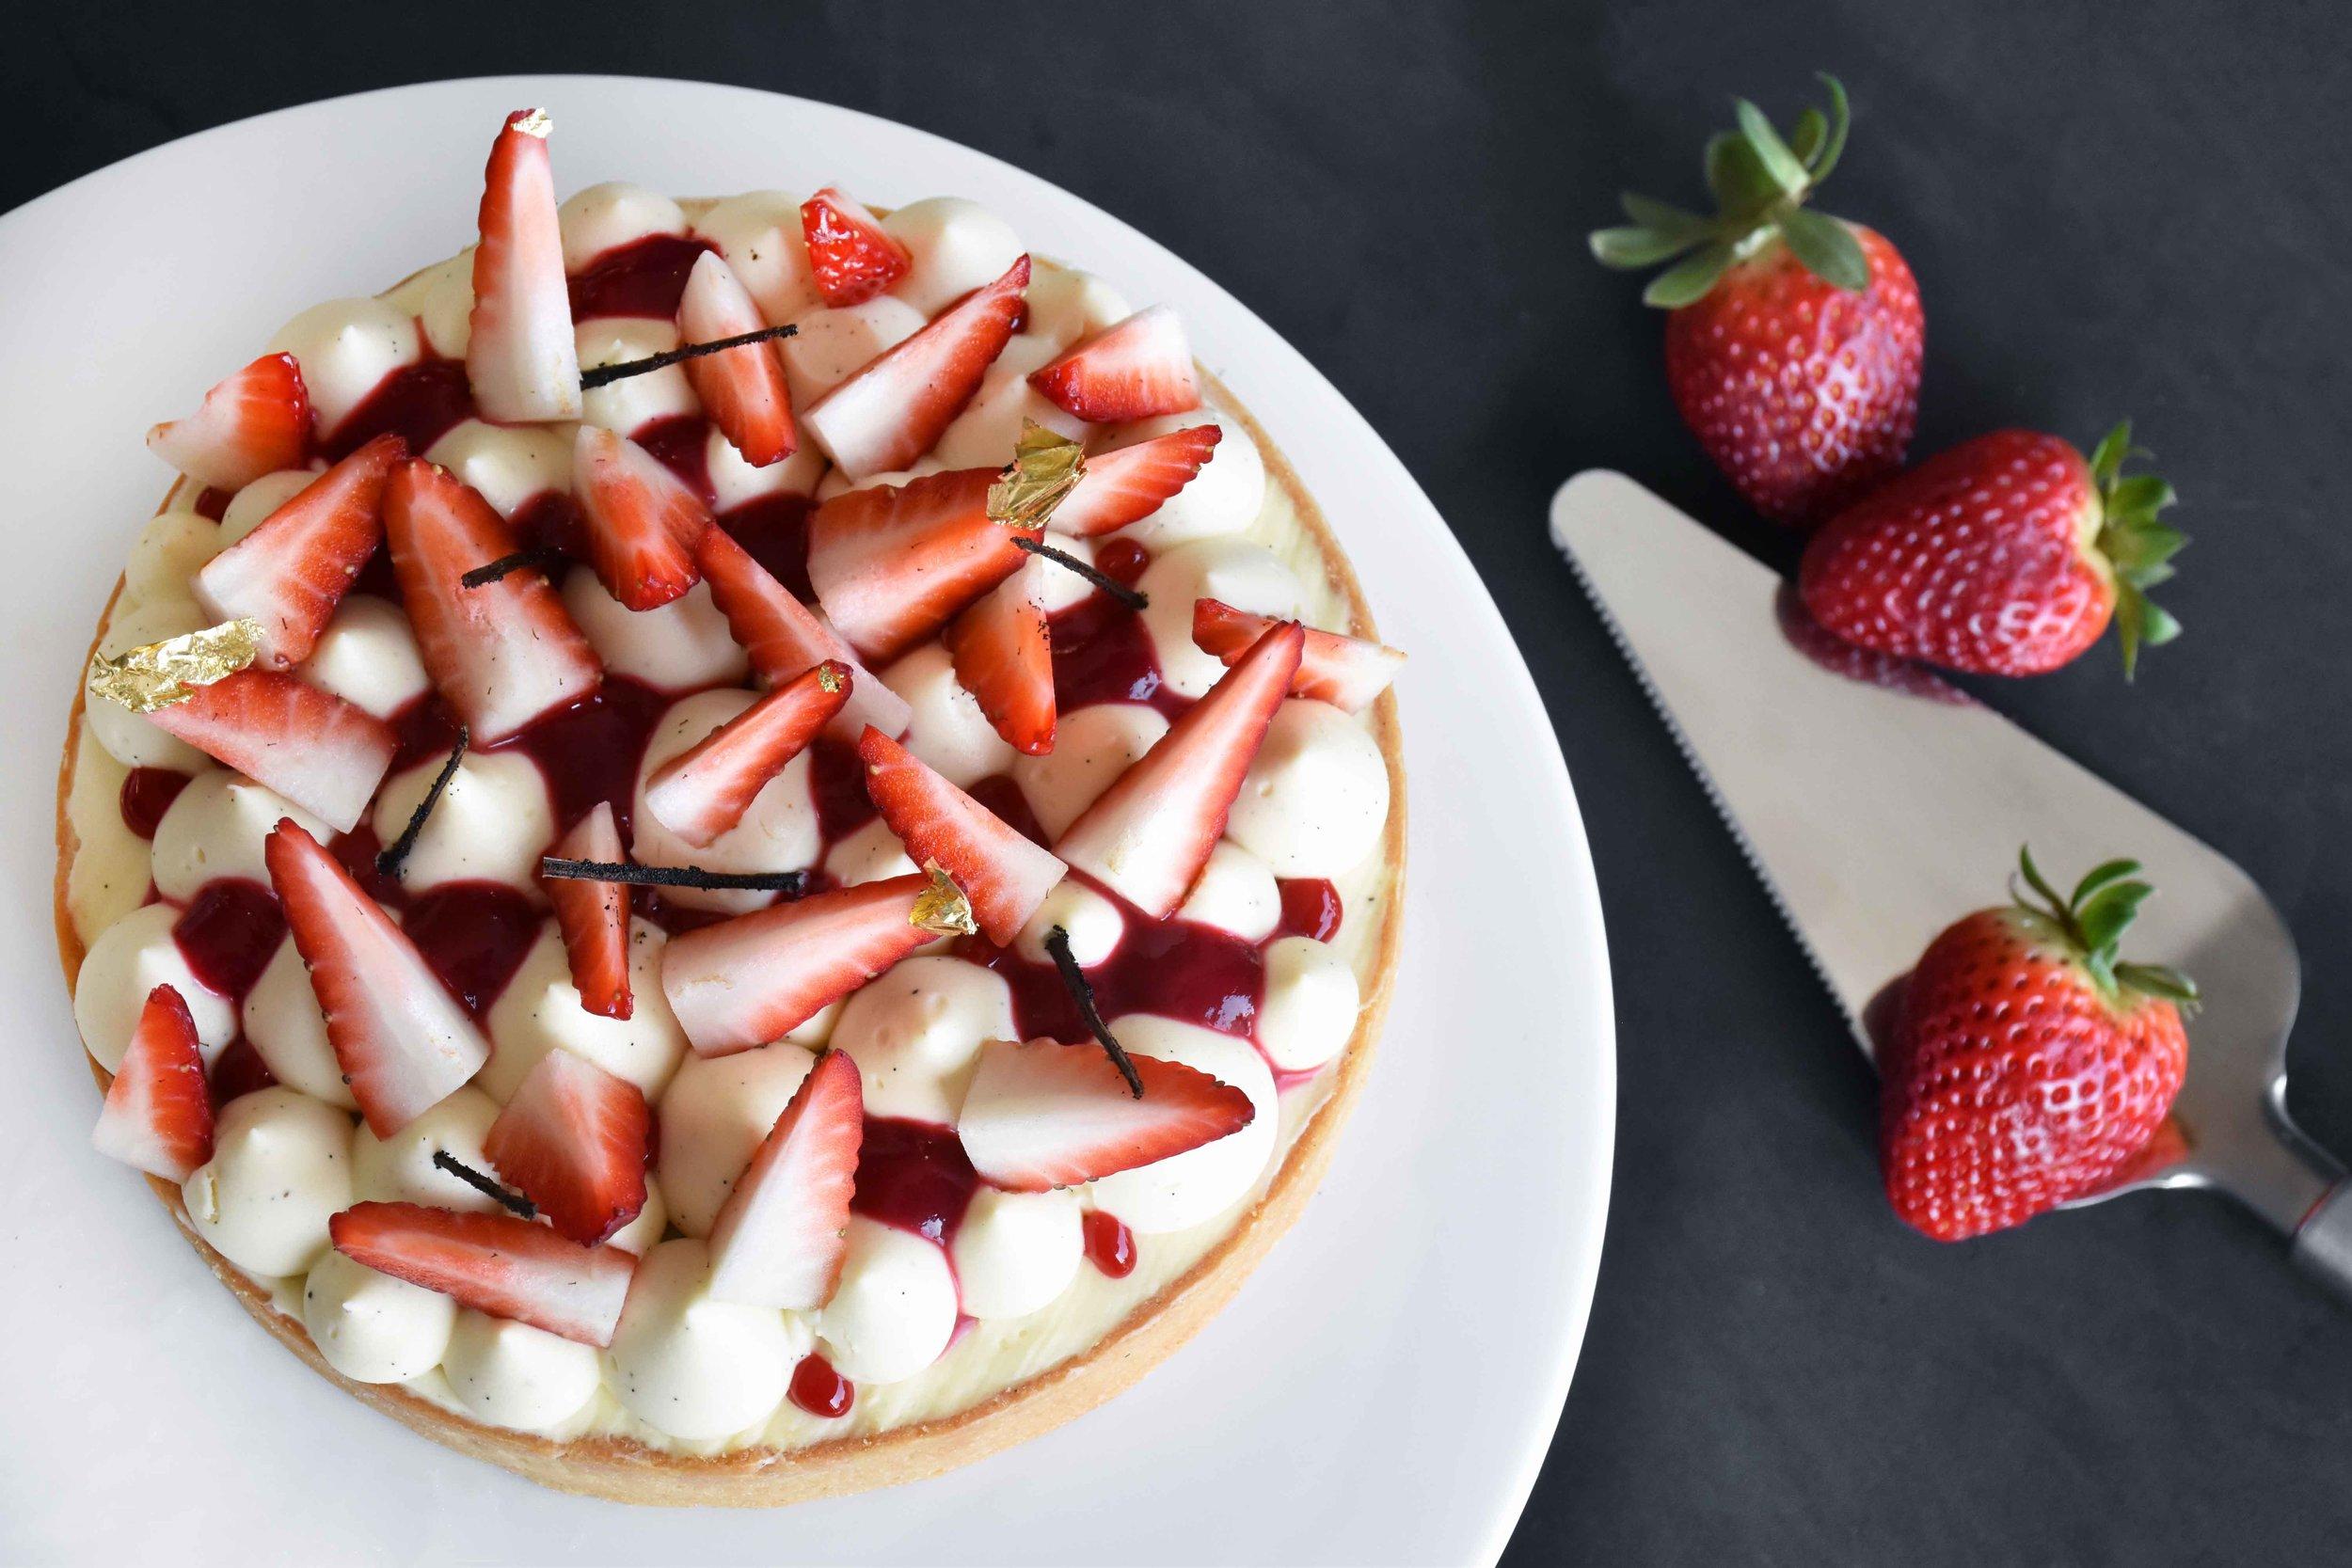 Strawberry Tart.jpg